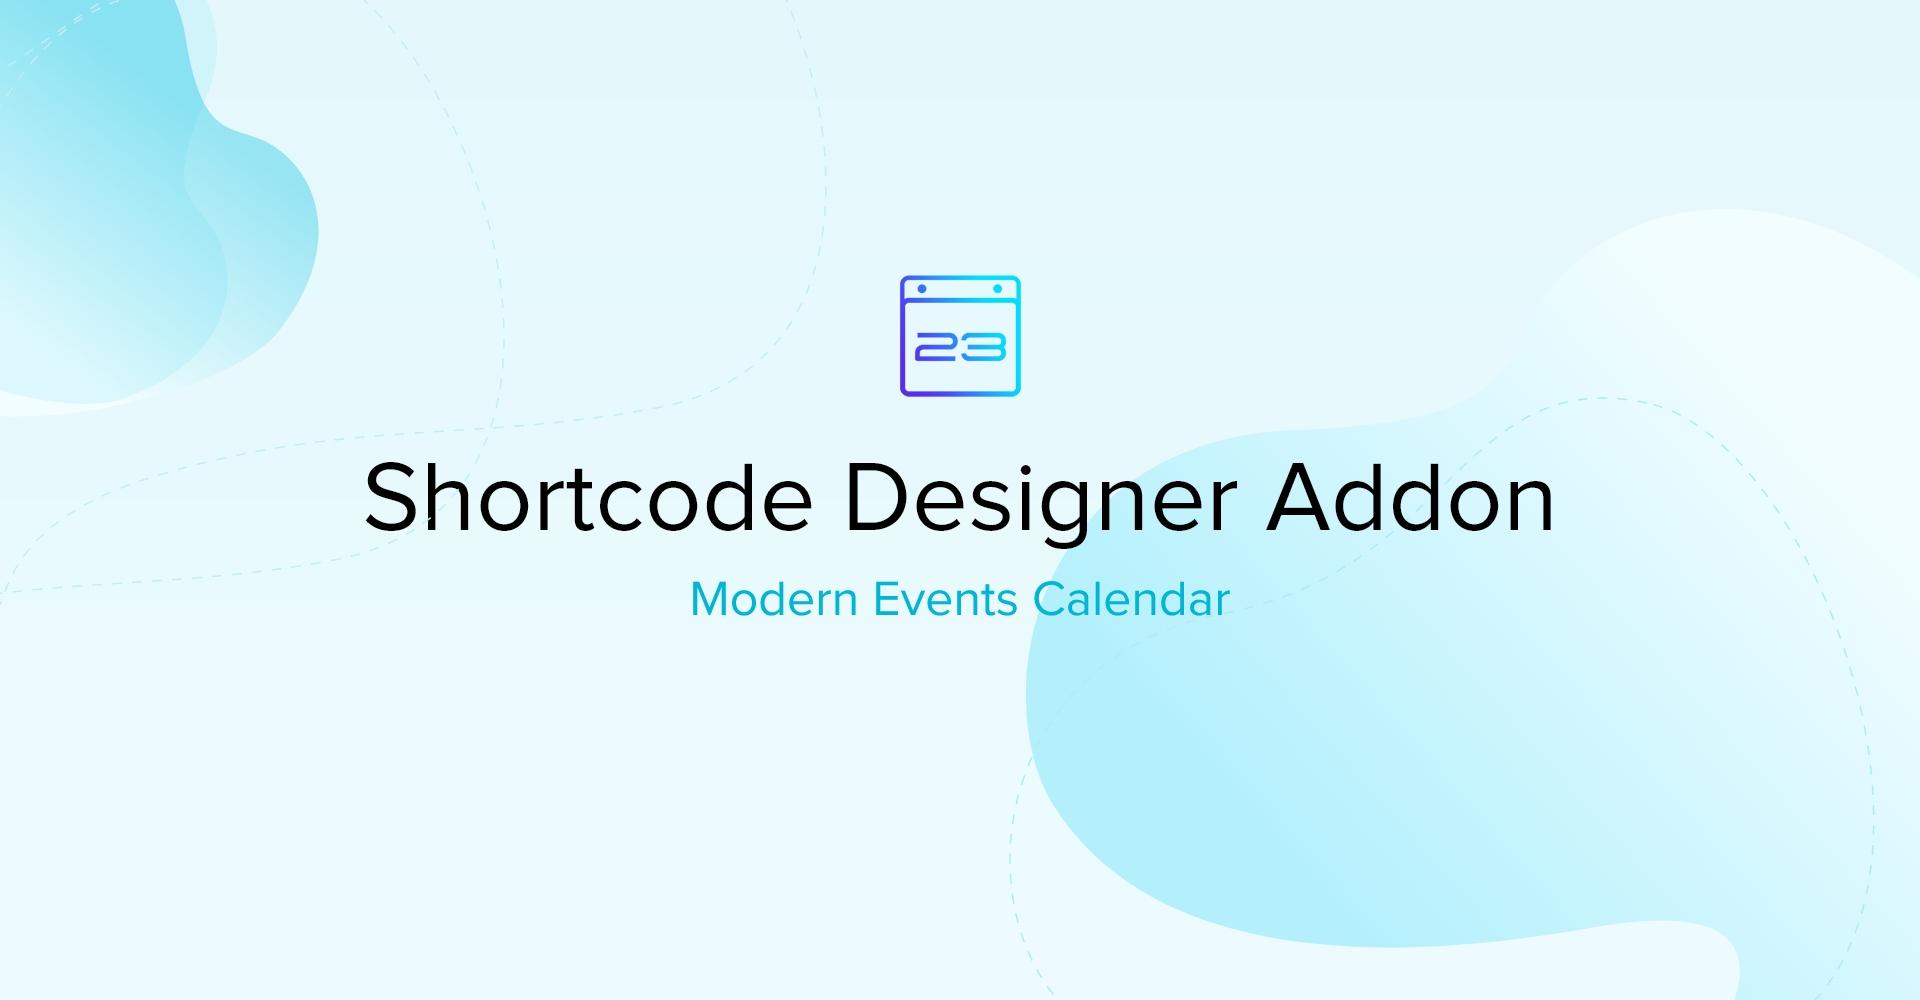 Modern event calendar Shortcode Designer Addon